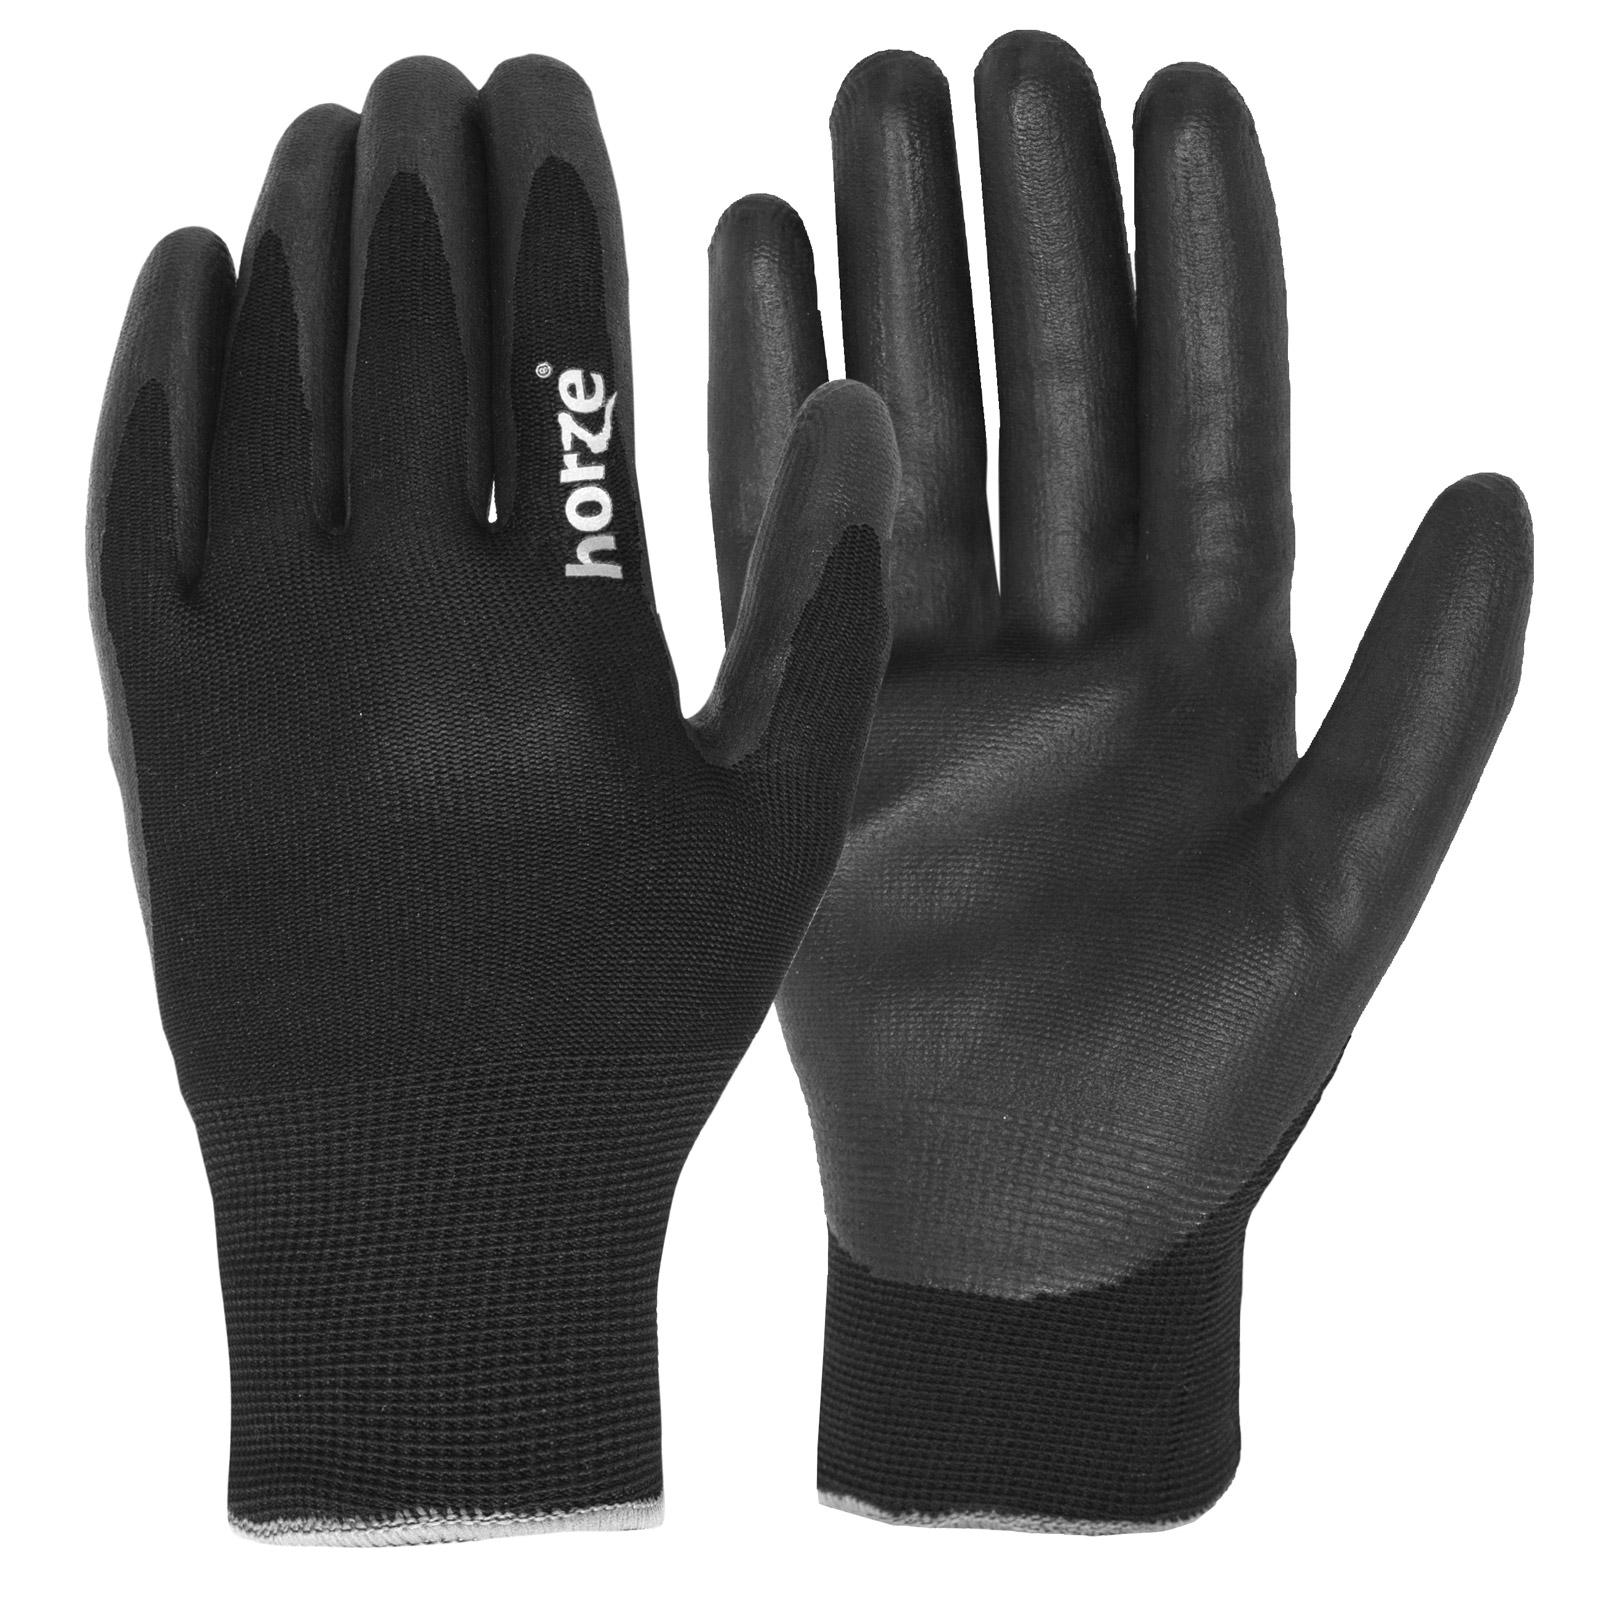 Buy Horze Winter Work Gloves